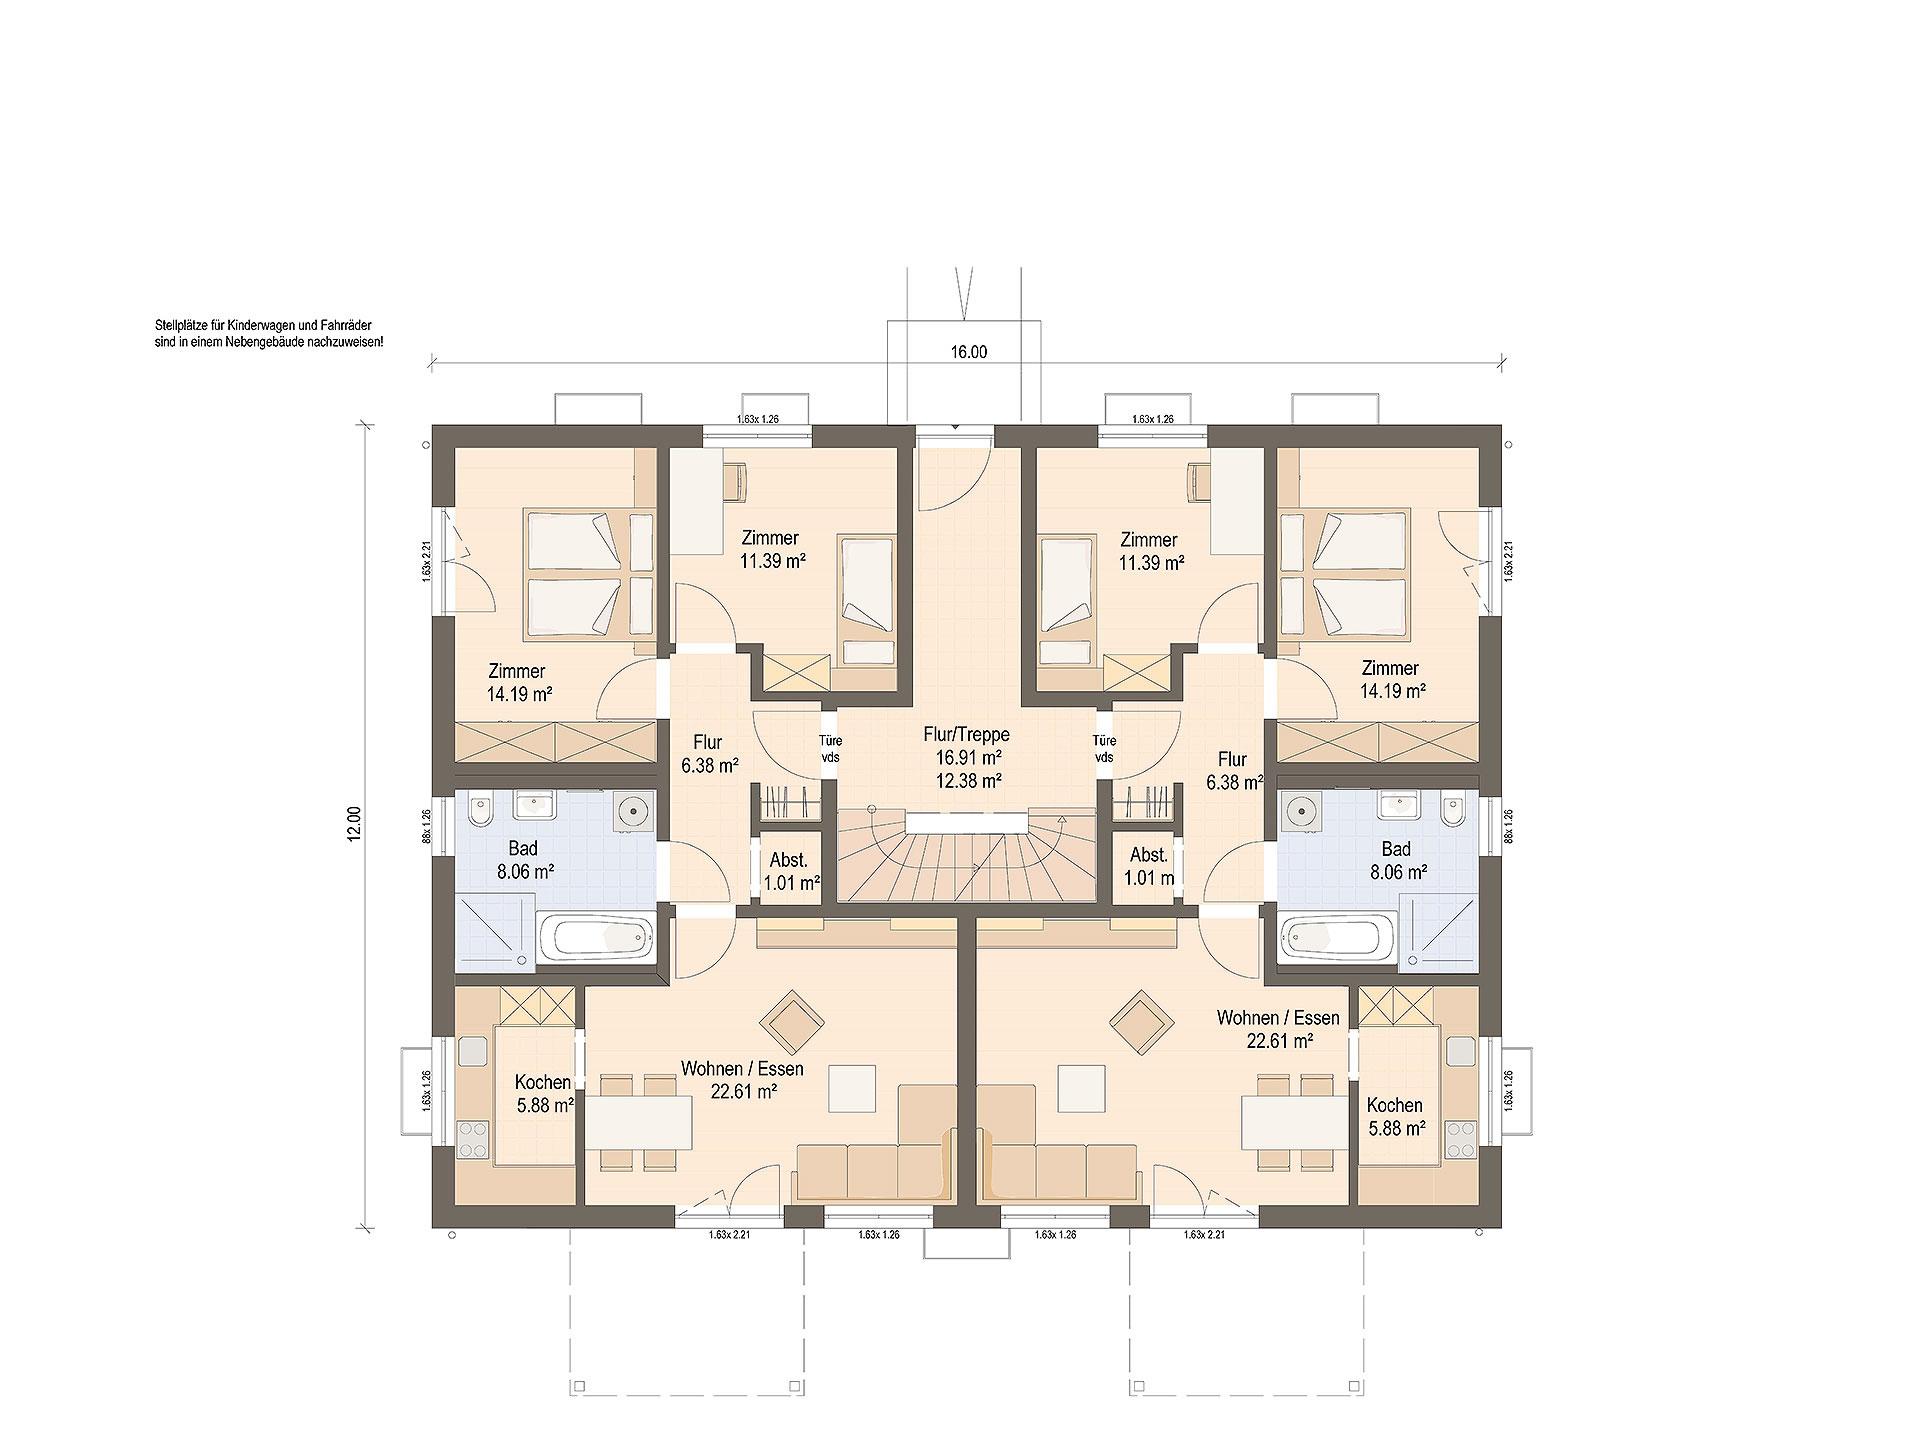 Erdgeschoss Haas WOB 6 A von Haas Fertigbau GmbH